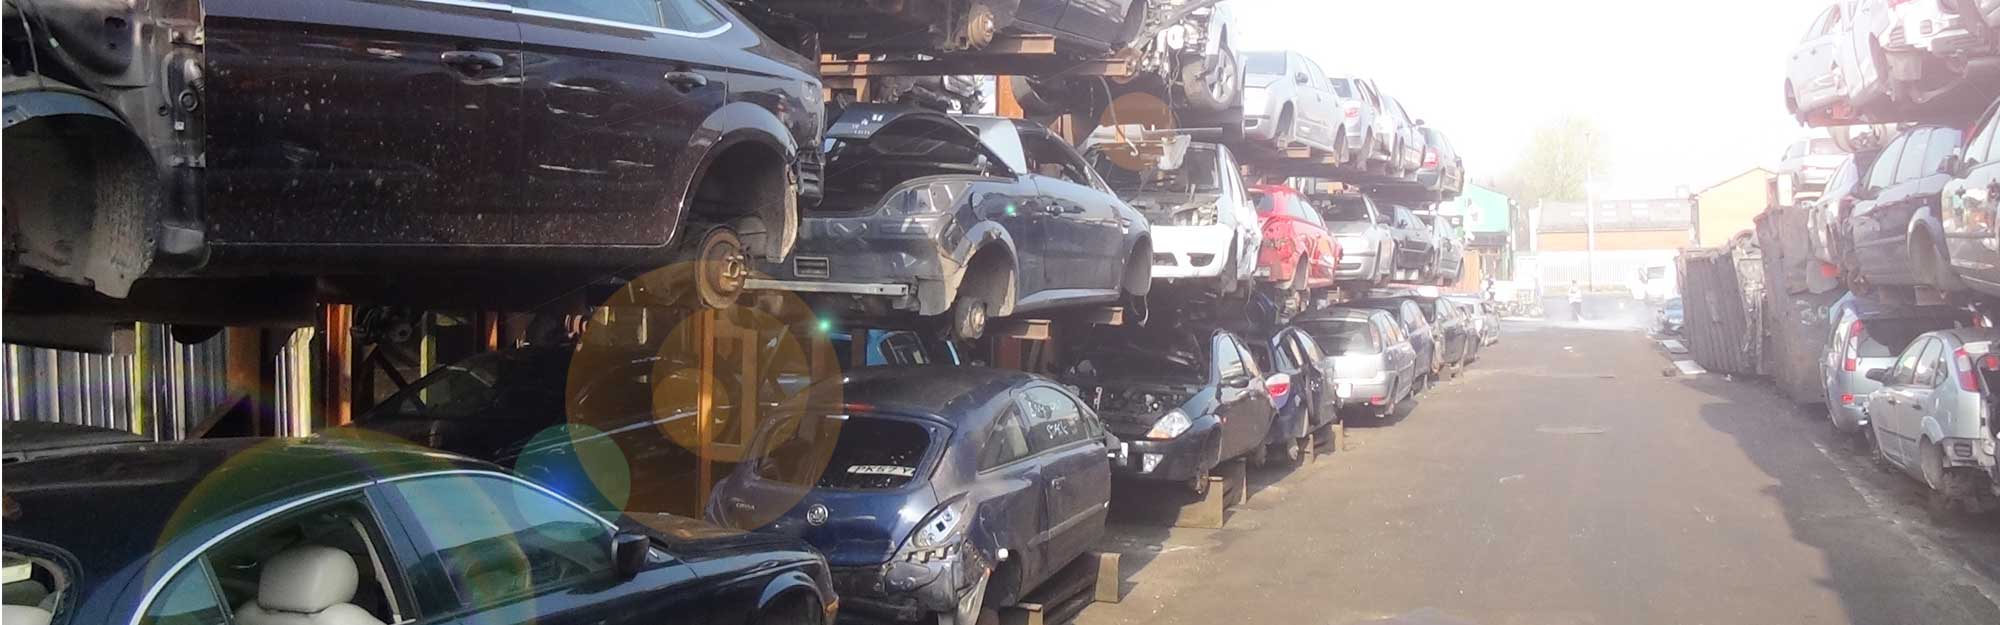 Scrap Car Waiheke Island - Cash for Cars - Unwanted Vehicle Buyers